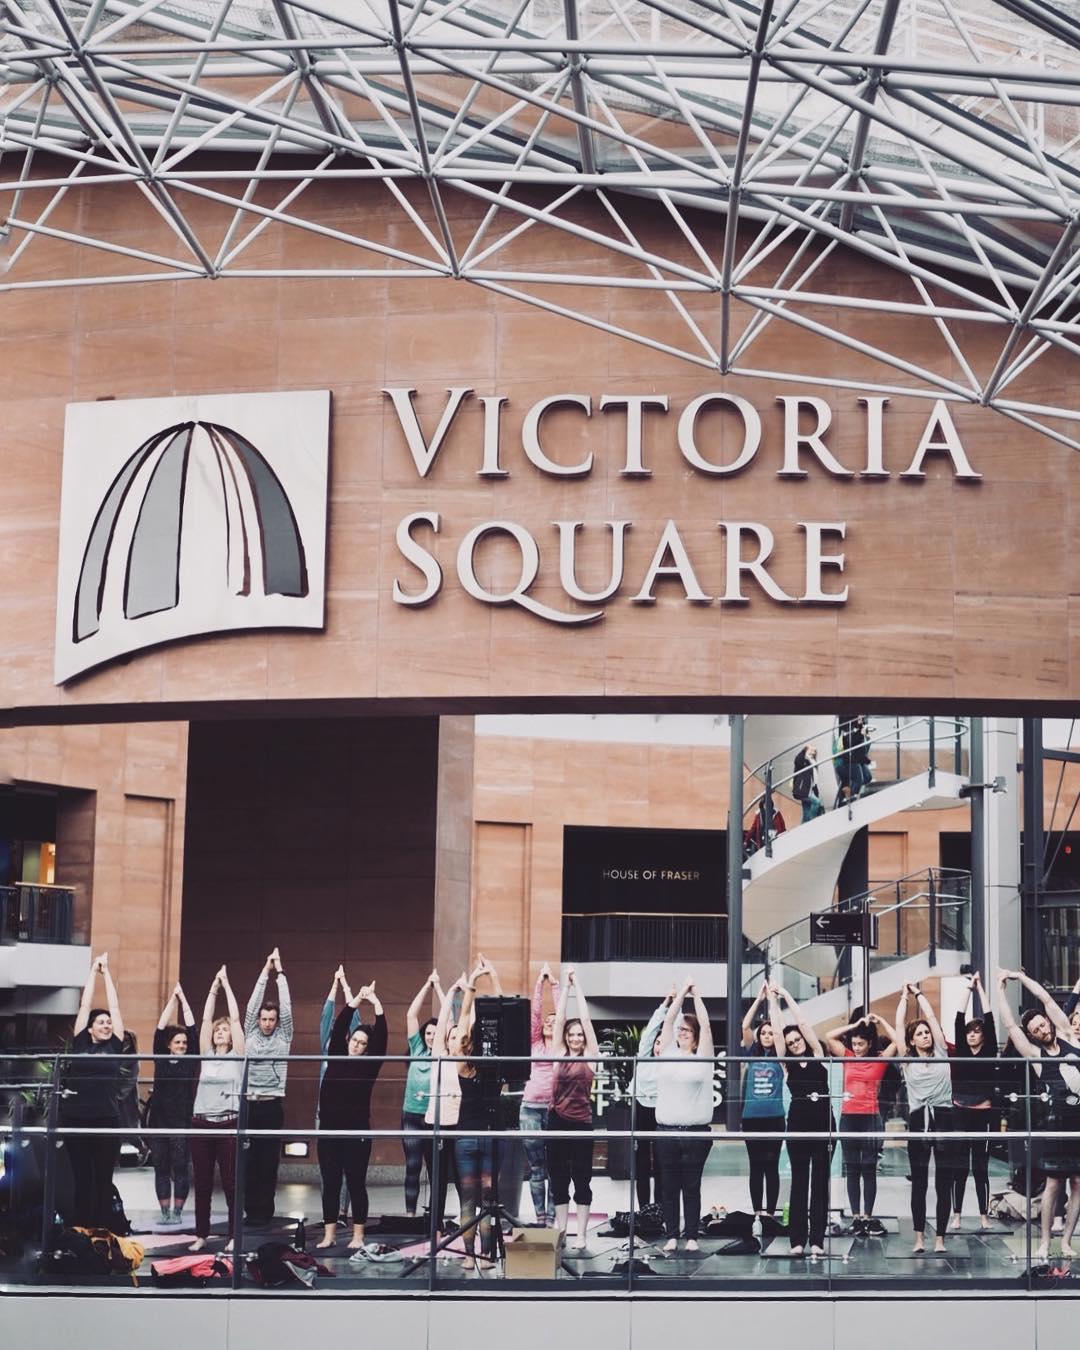 Flow Yoga Victoria Square Culture Night Belfast Fitness Belfast Photo by Stephen Johnston insta spjplanning.jpg